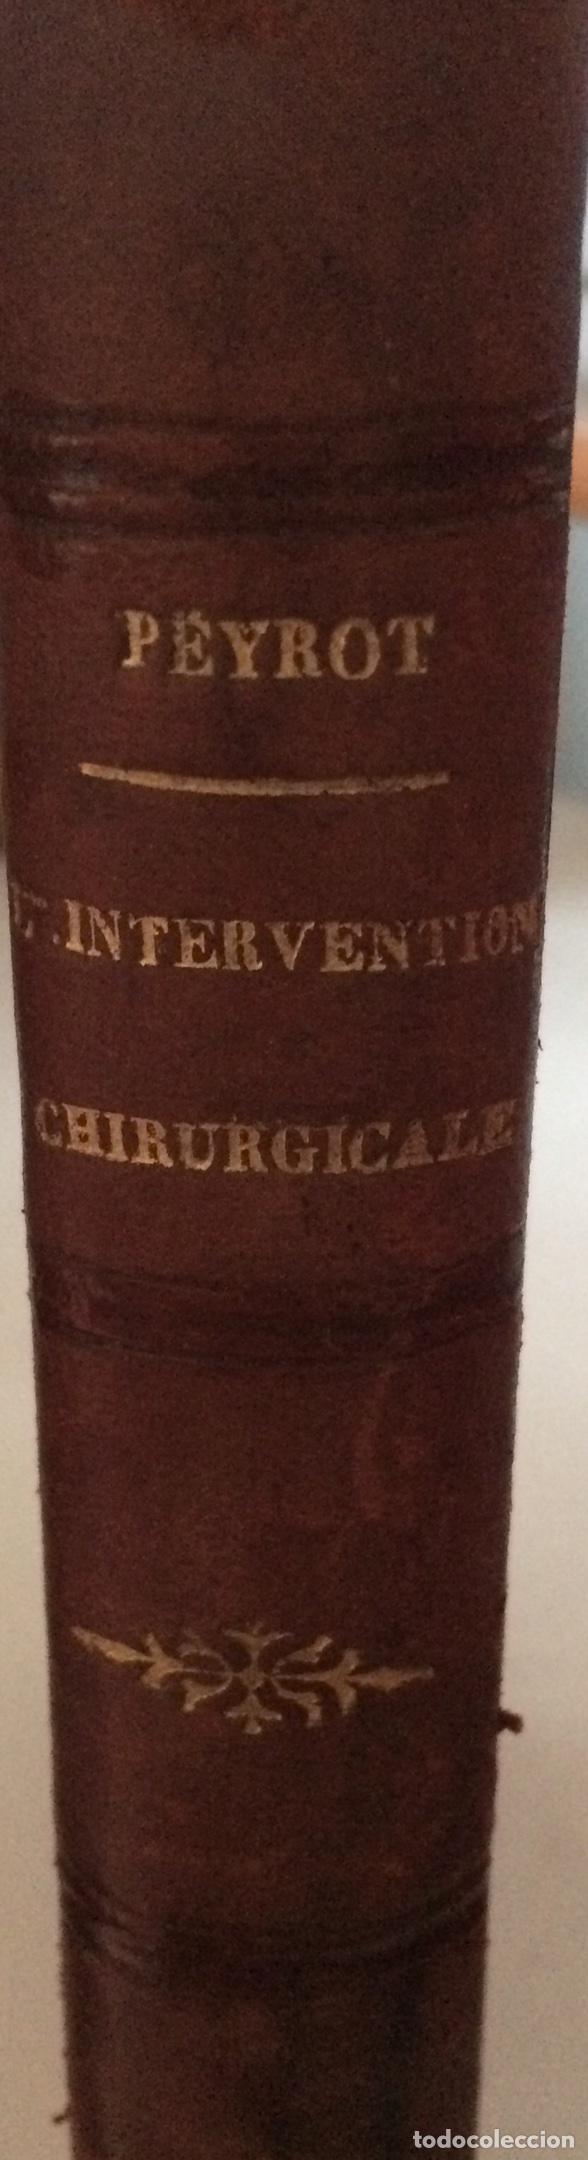 Libros antiguos: De Lintervention Chirurgicale Lobstruction intestinable JJ Peyrot - Foto 2 - 92887668